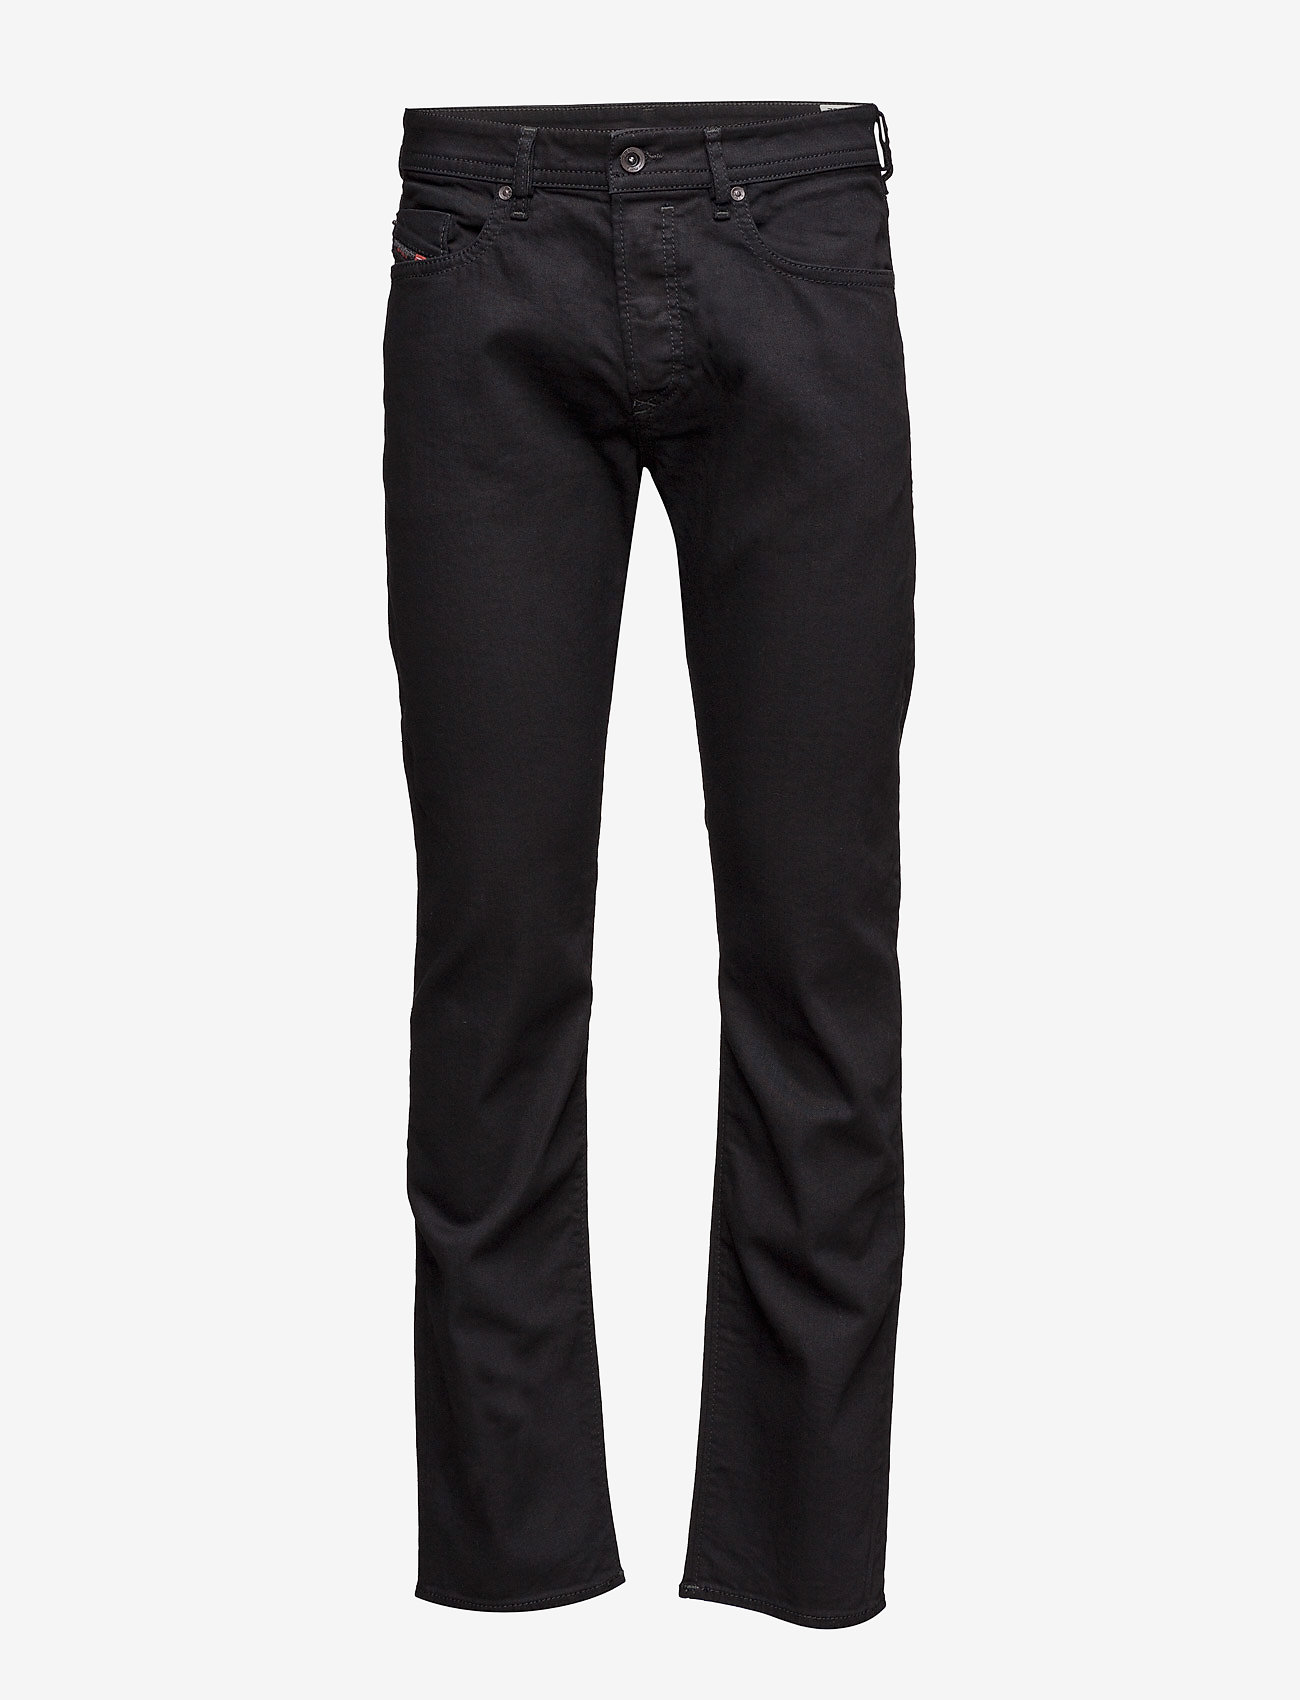 Diesel Men - BUSTER - regular jeans - grey